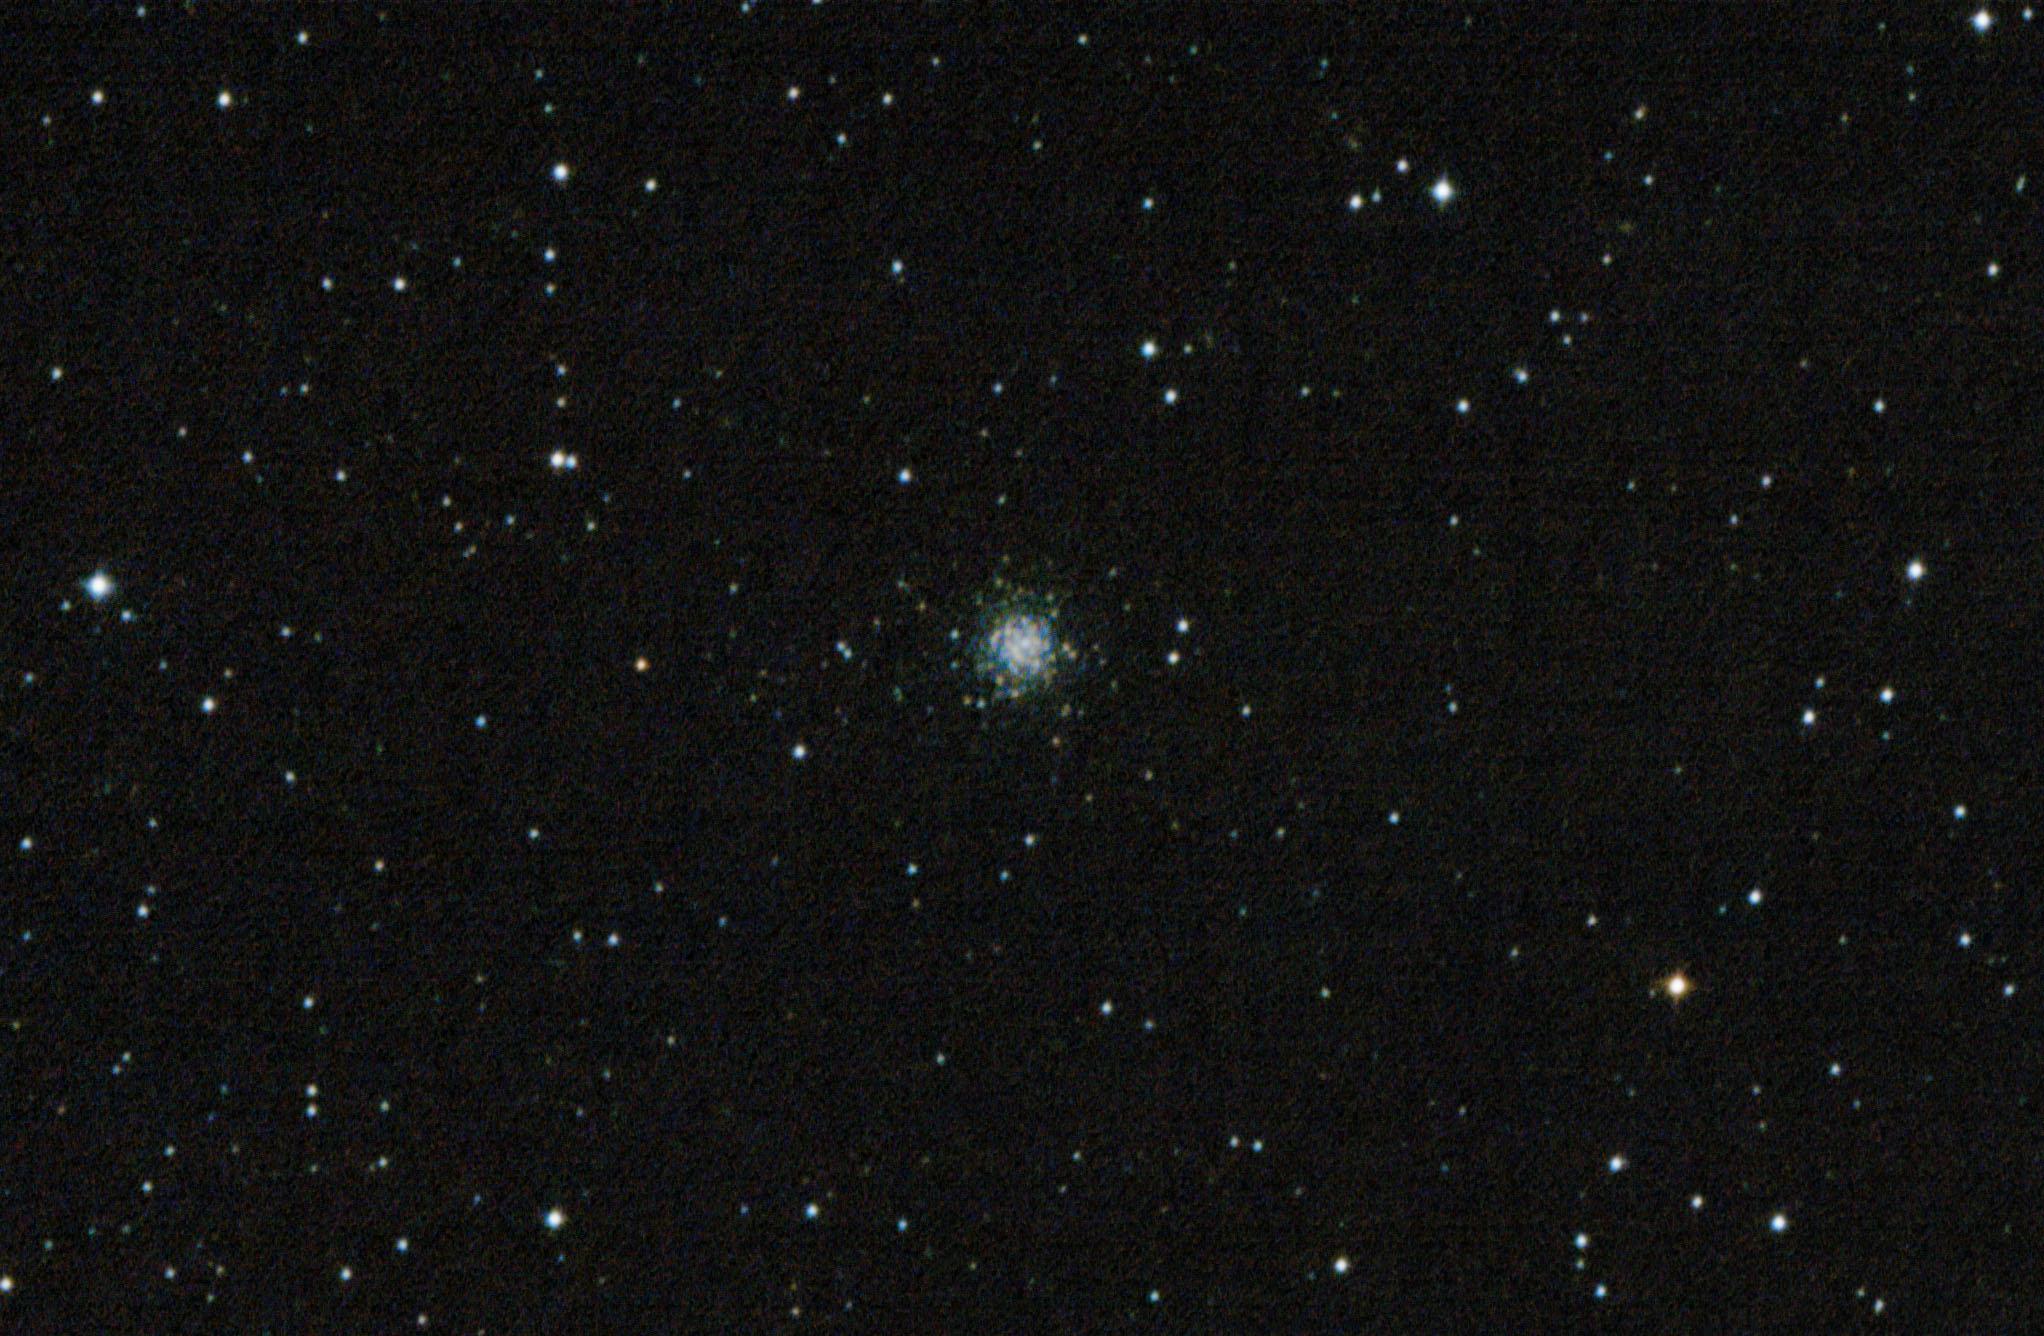 NGC 7006 Globular Cluster in Delphinus いるか座の球状星団